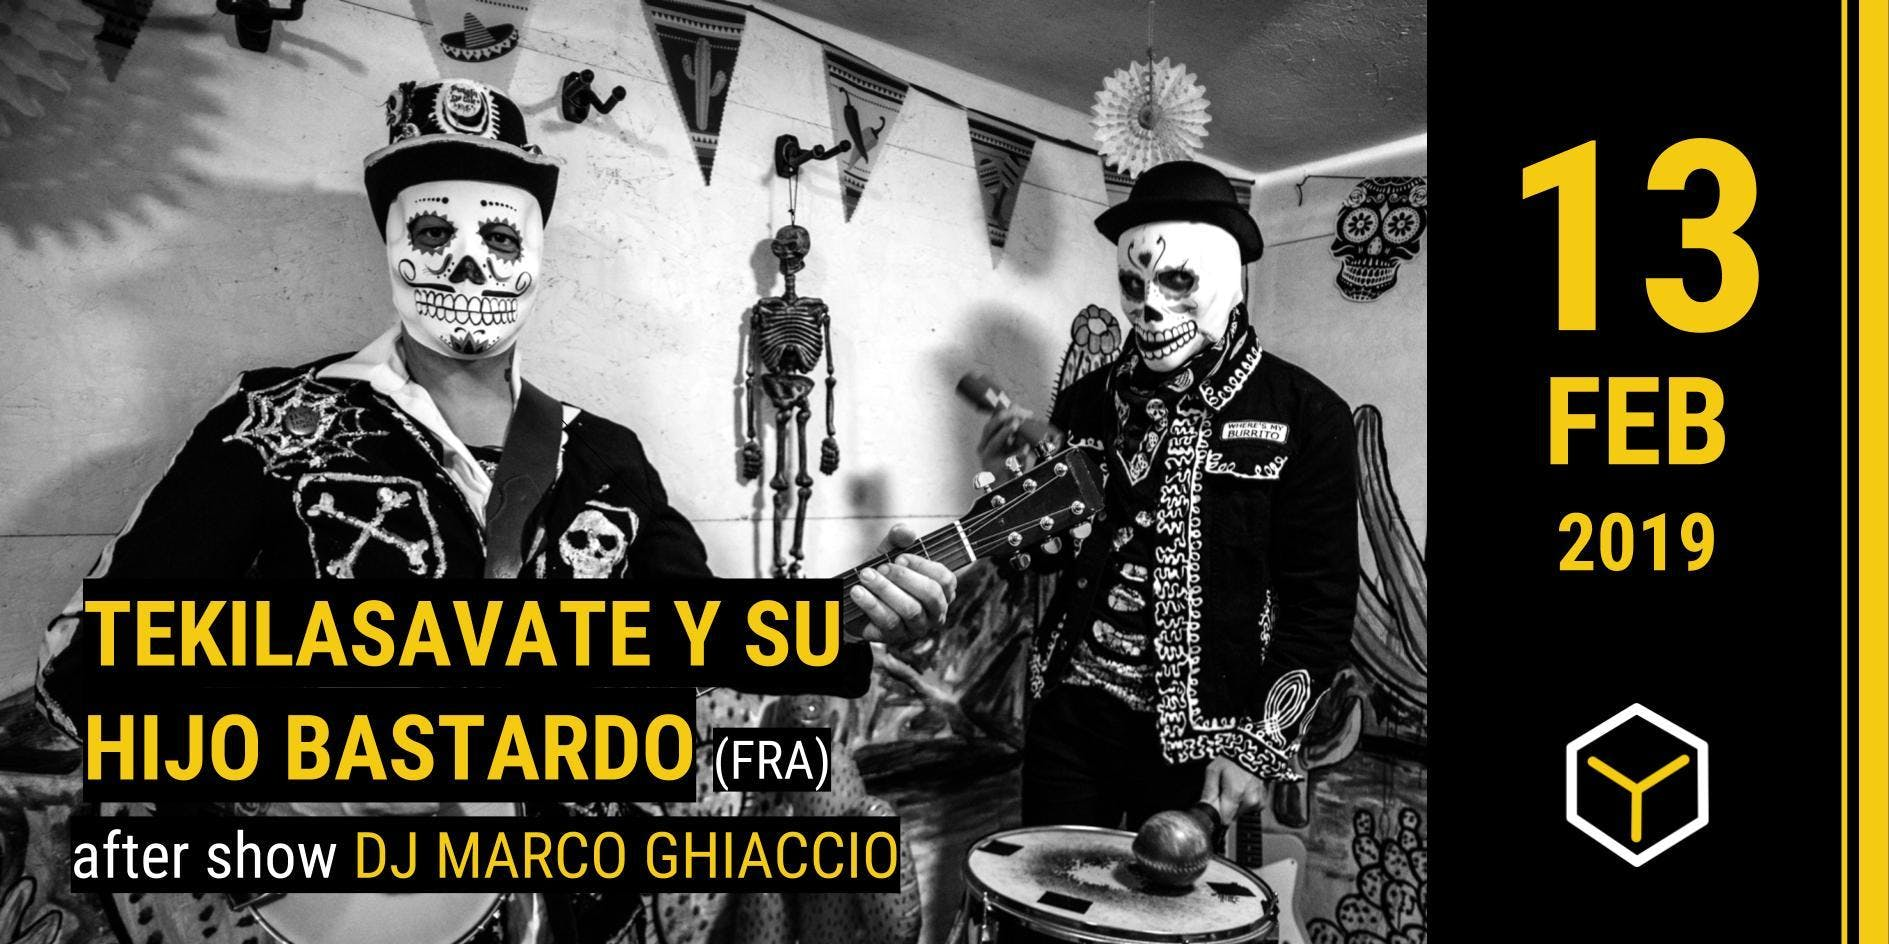 Tequilasavate y su Hijo Bastardo (FRA) - The Yellow Bar